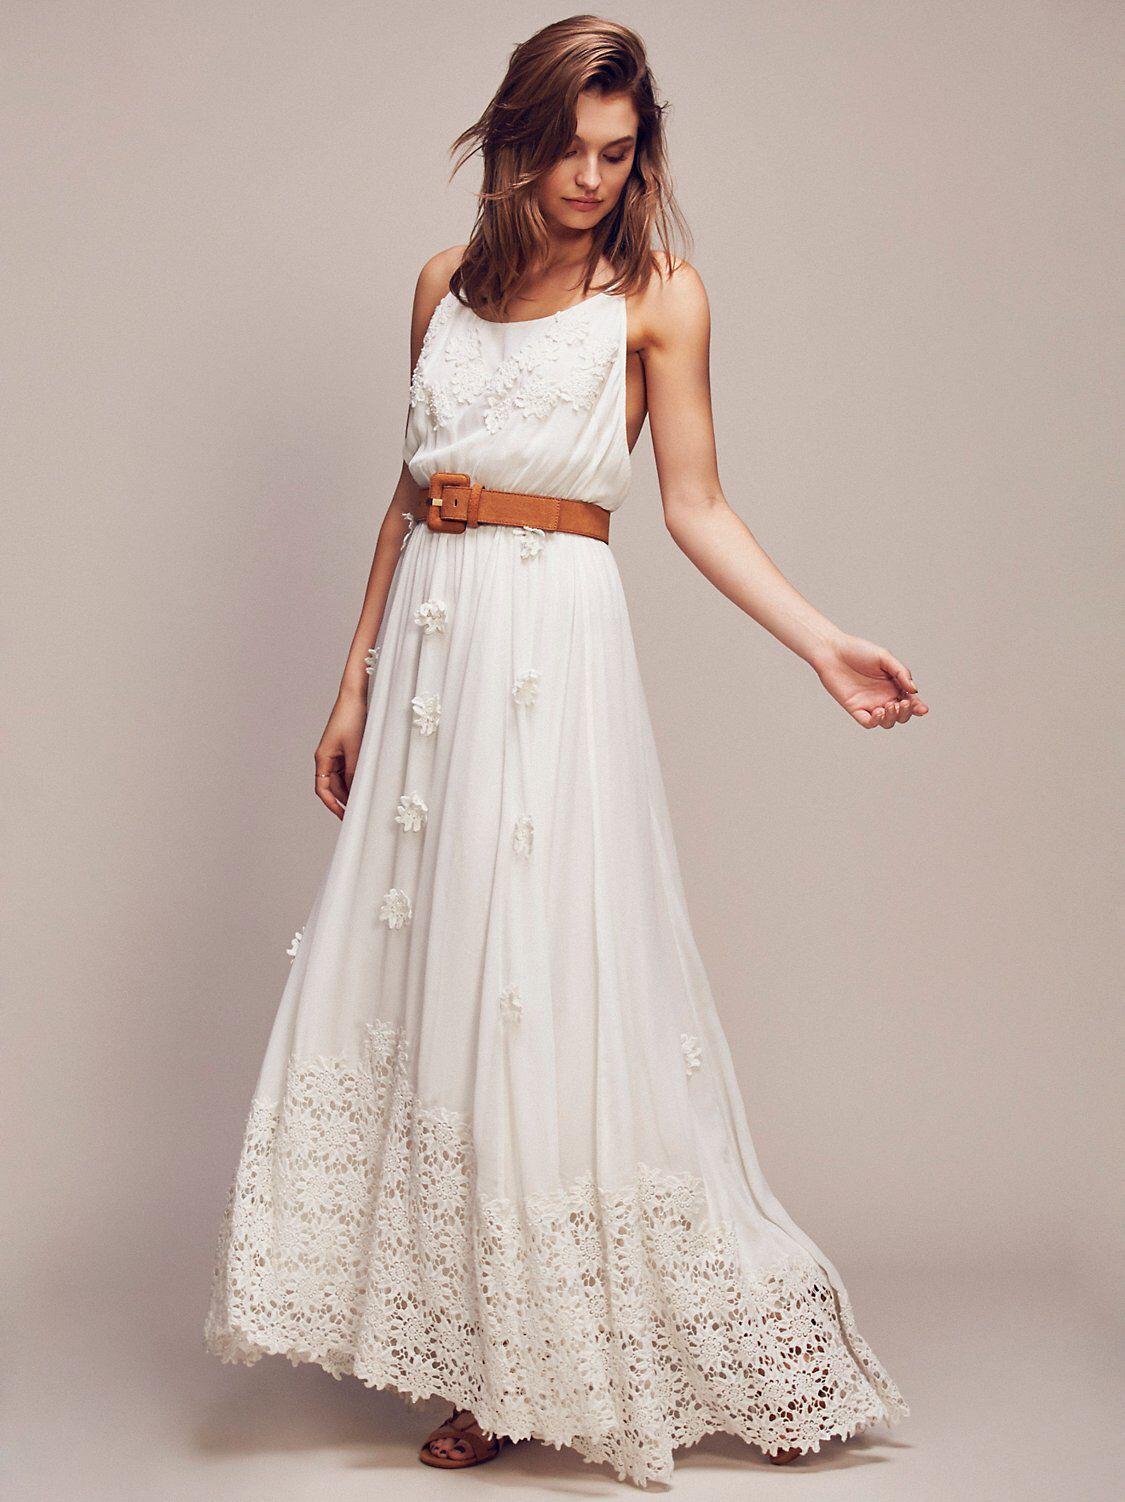 Daisy Petal Maxi Affordable wedding dresses, Alternative